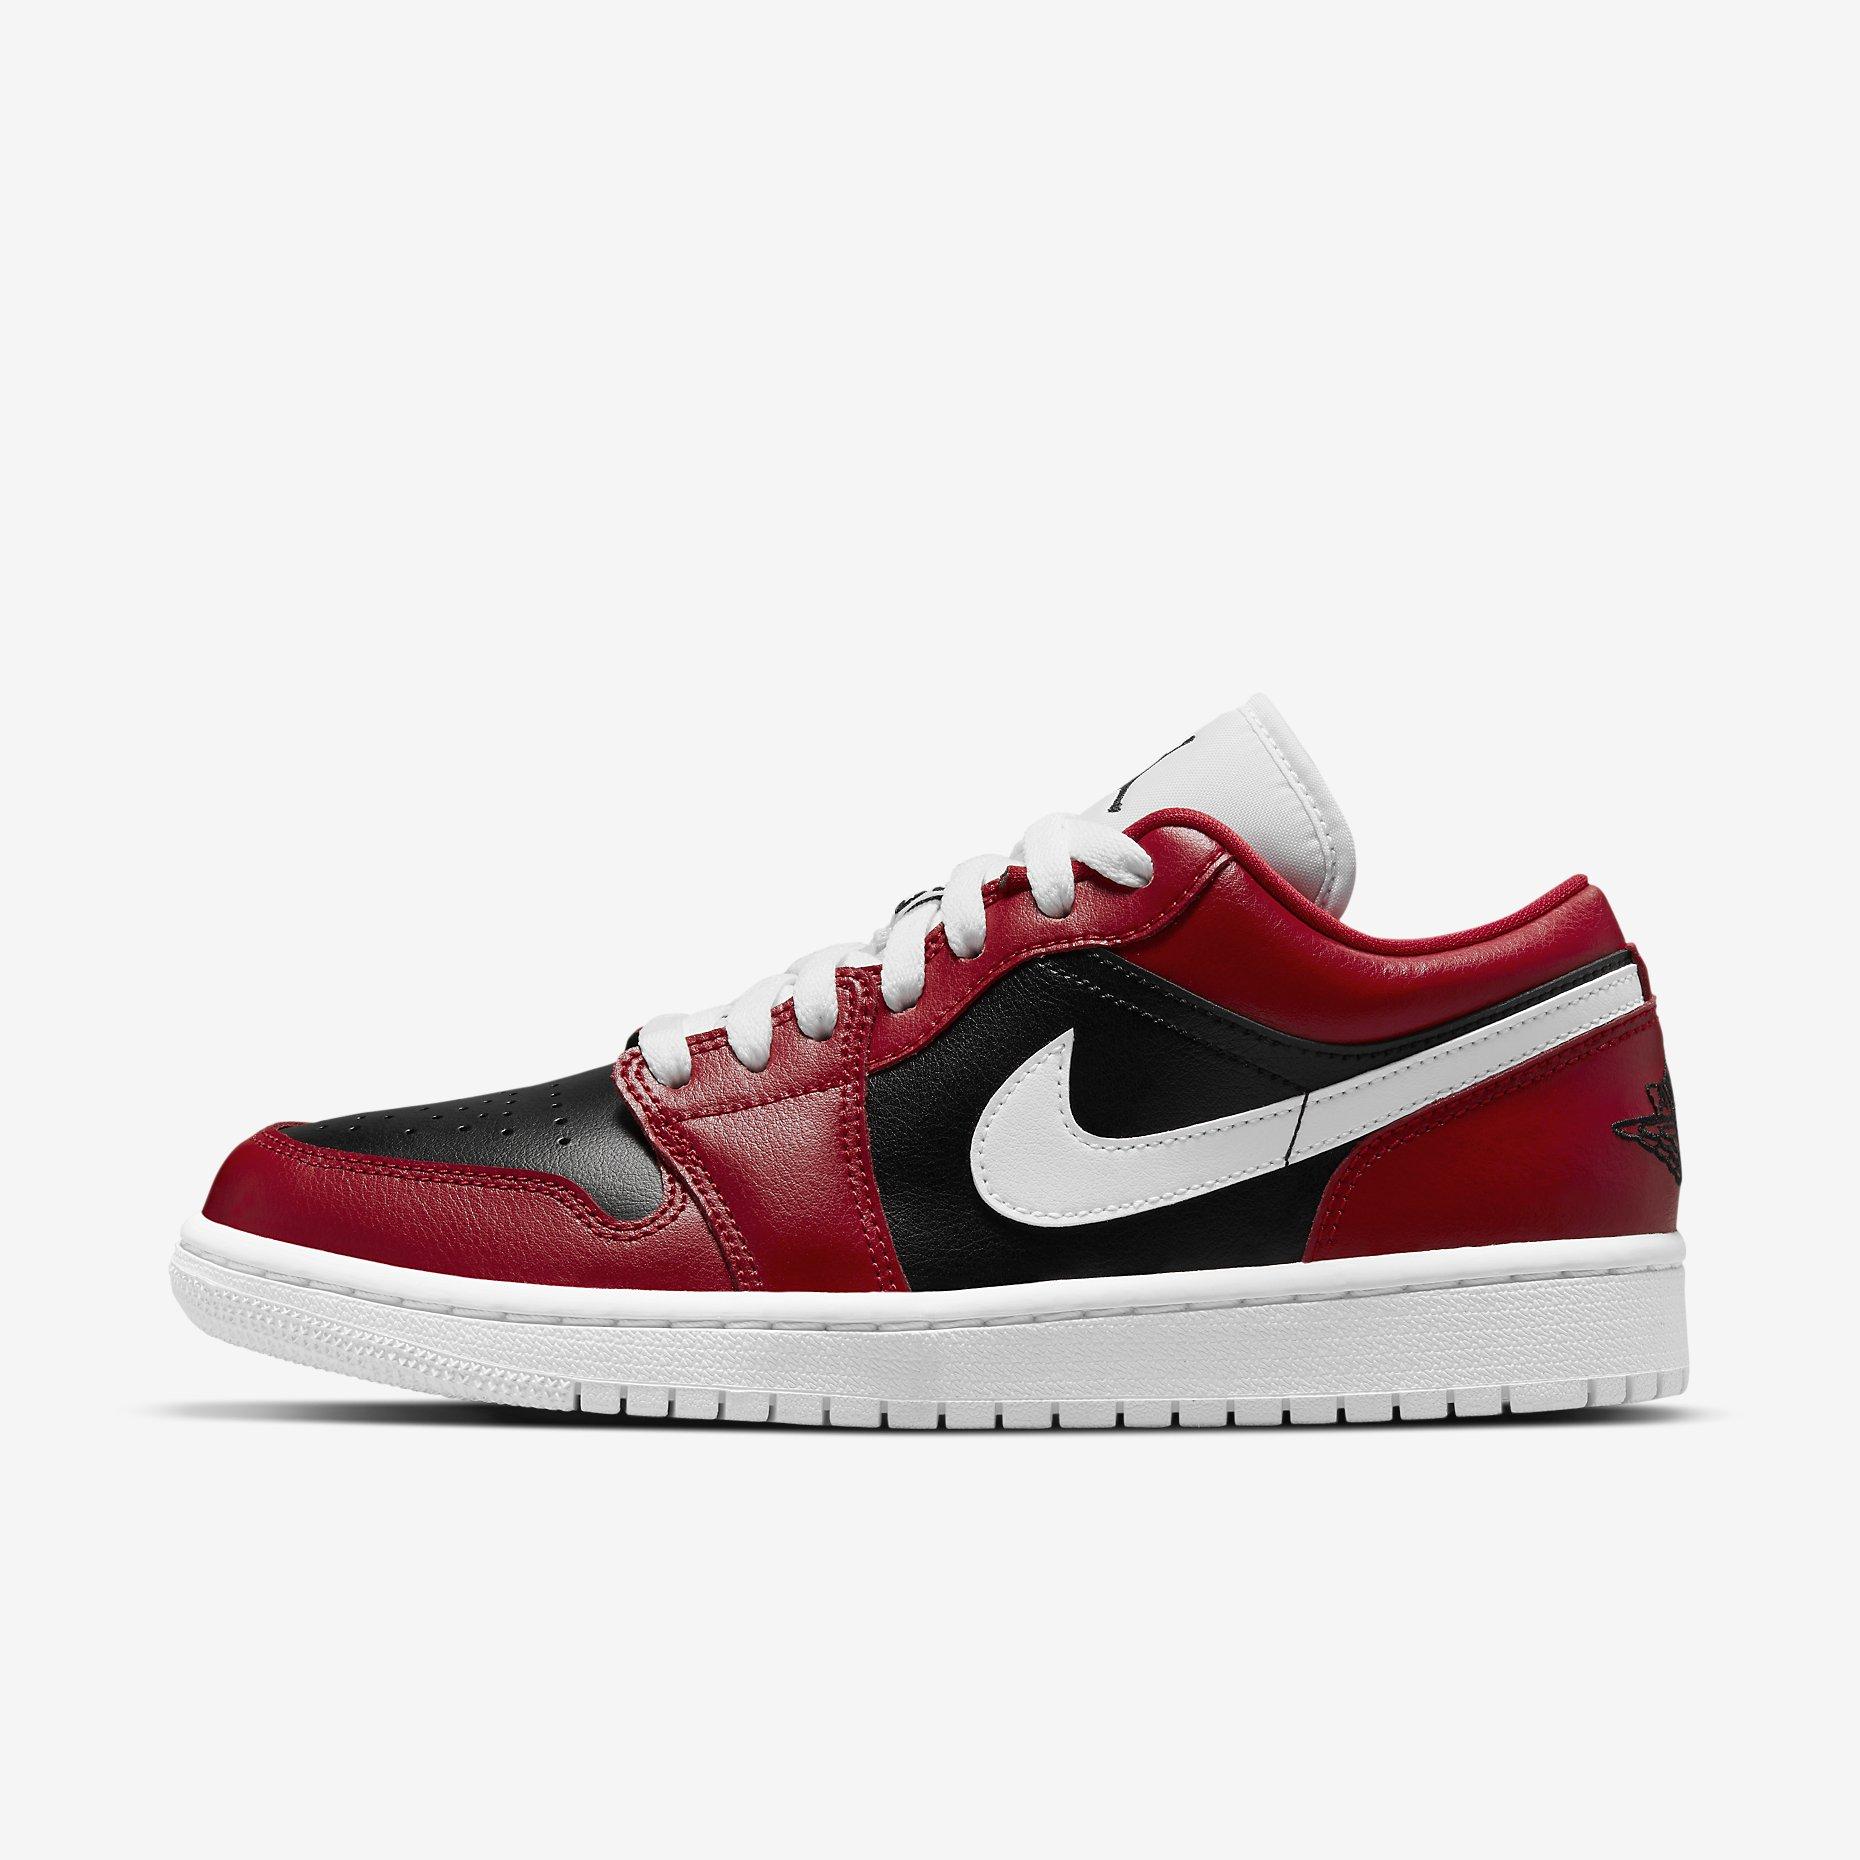 Women's Air Jordan 1 Low 'Gym Red/White/Black' - Chicago Flip}